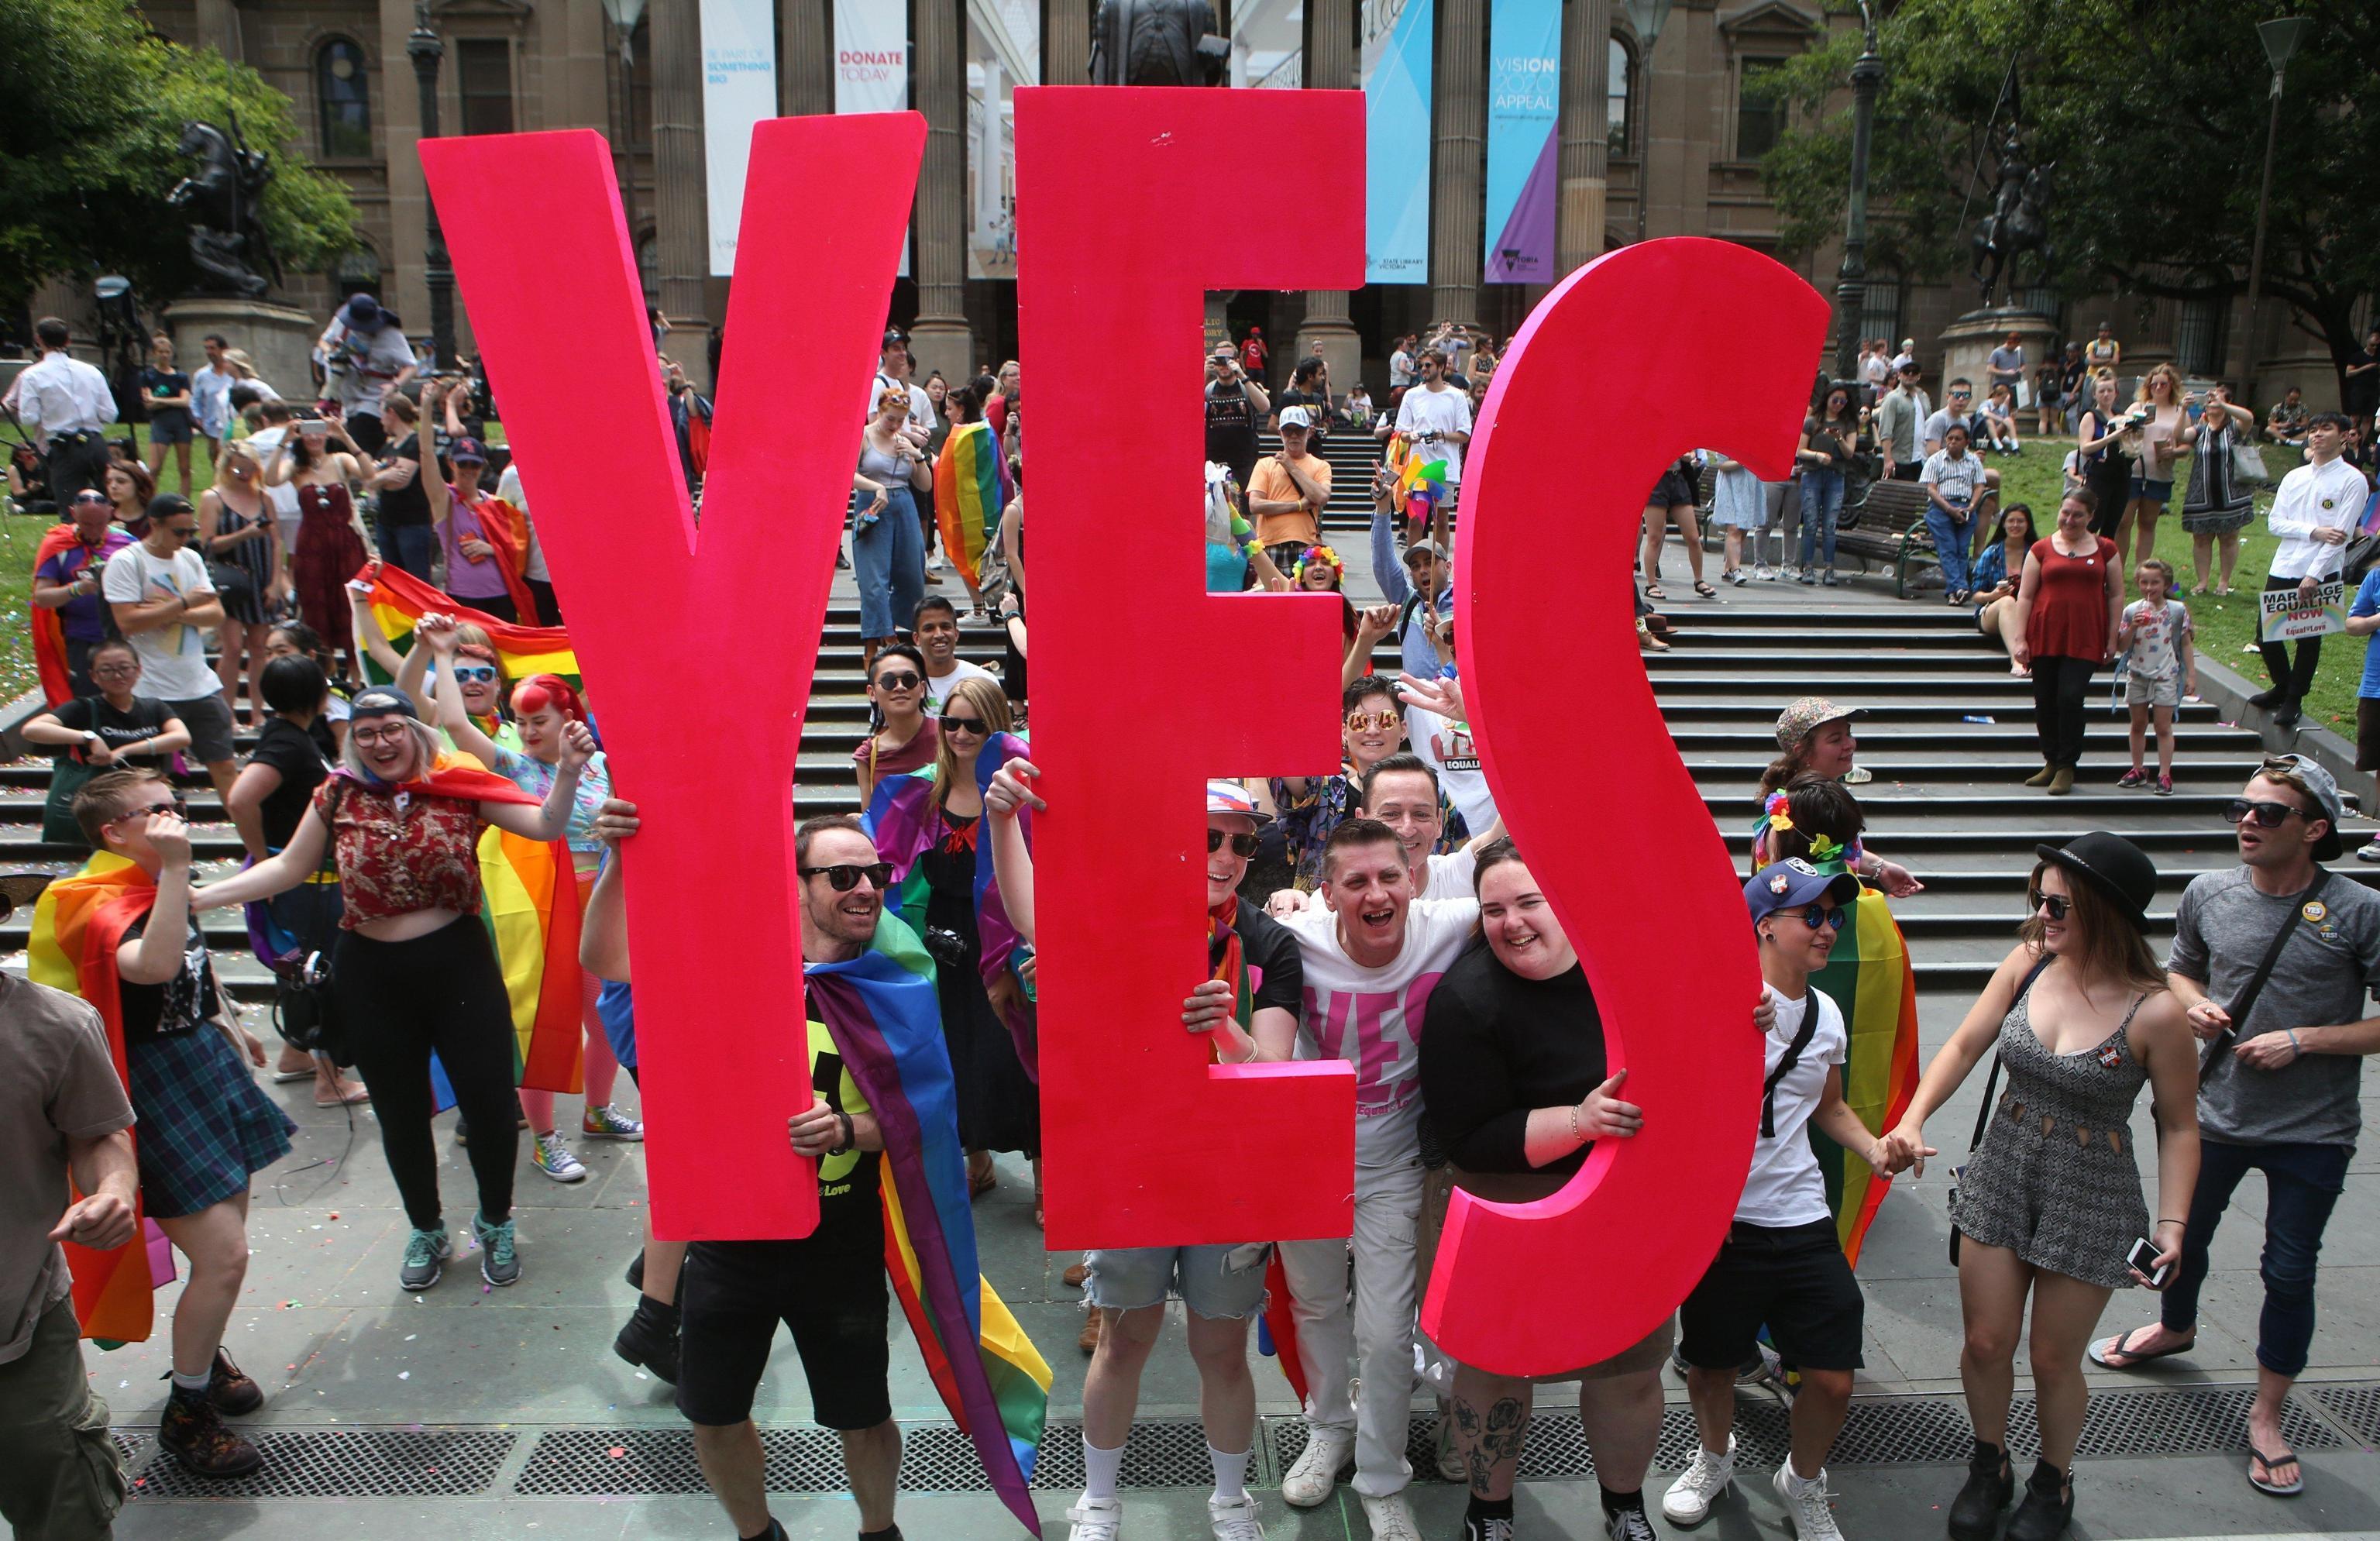 Australia: vince sì a matrimoni gay